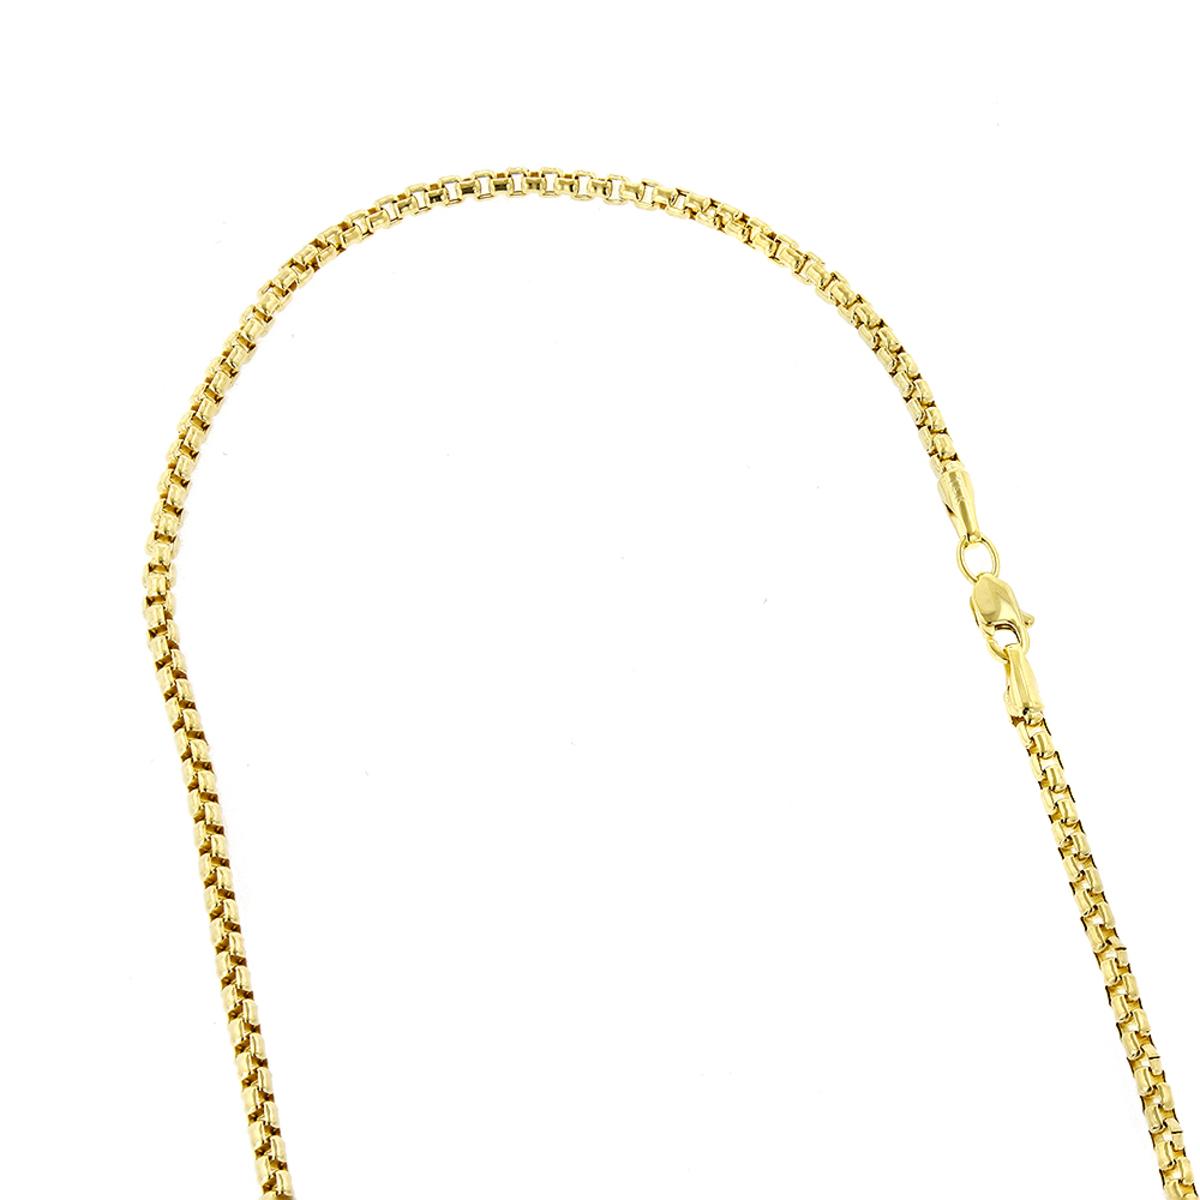 LUXURMAN Solid 14k Gold Box Chain For Men & Women Round 2.4mm Wide